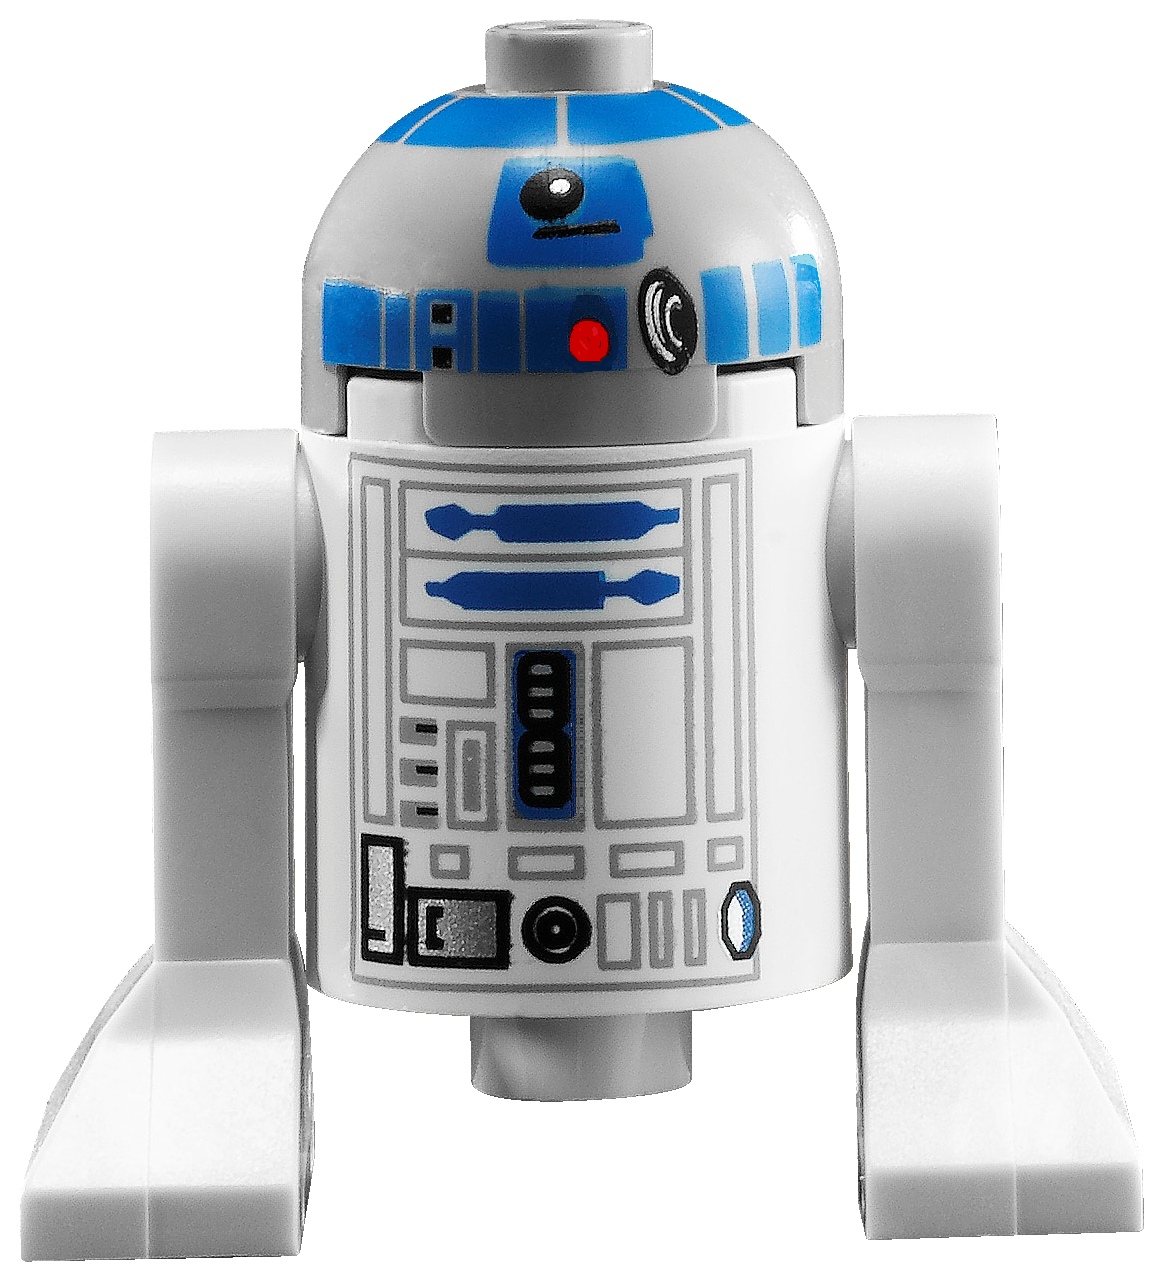 R2-D2 | Brickipedia | FANDOM powered by Wikia